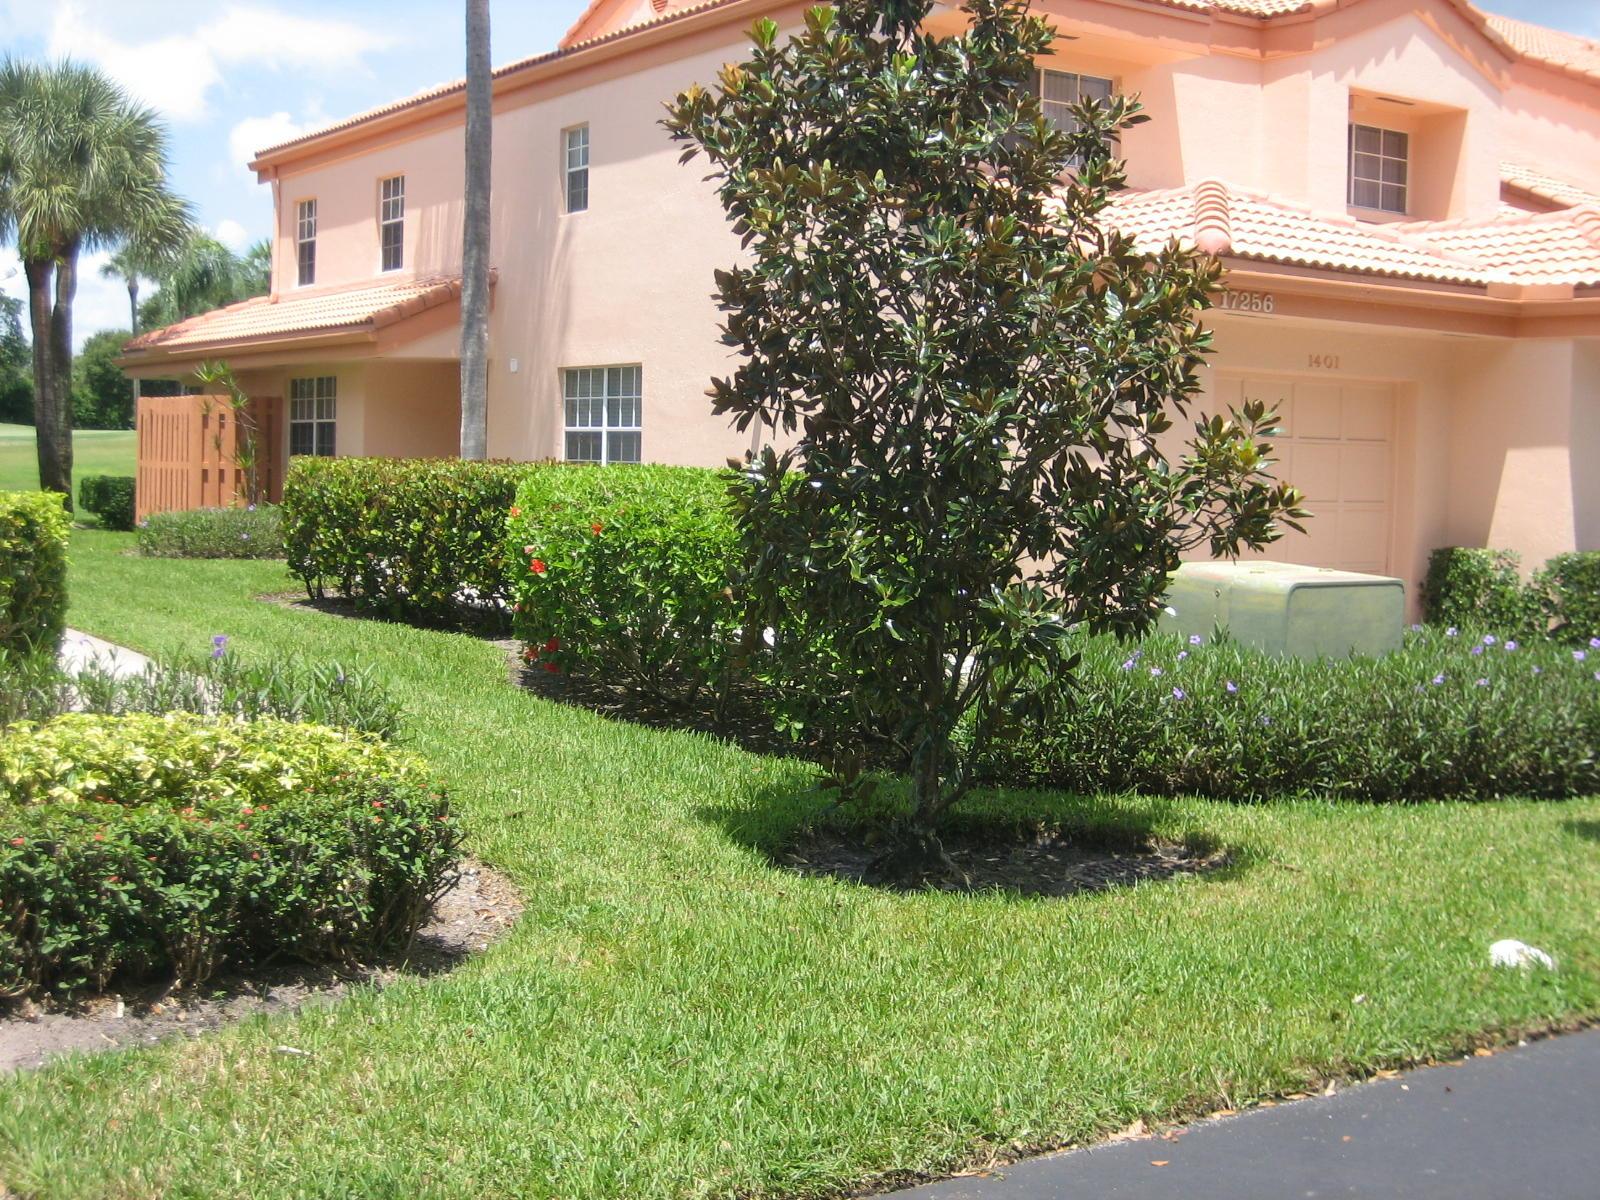 17256 Boca Club Boulevard 1401 Boca Raton, FL 33487